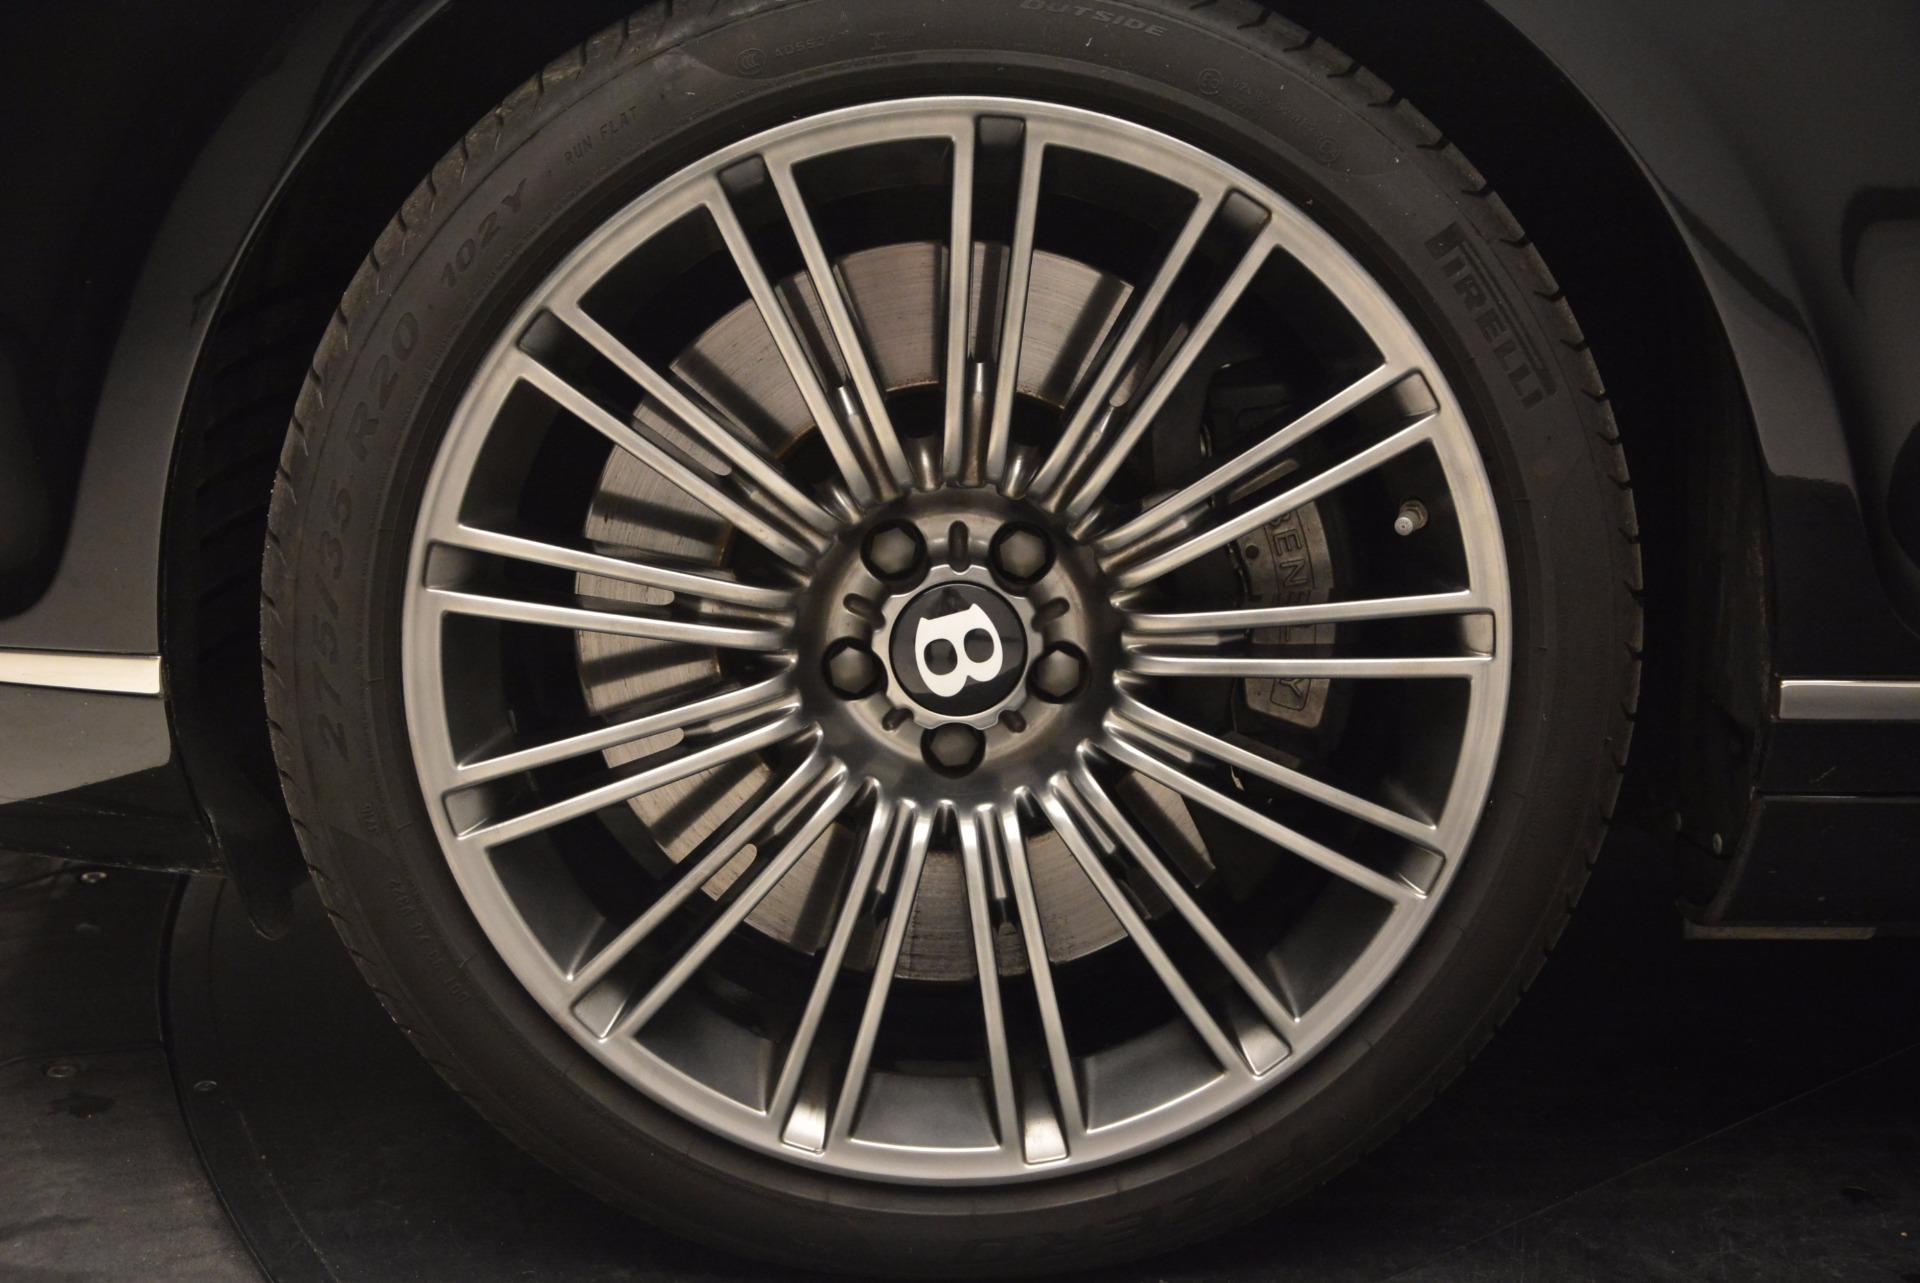 Used 2010 Bentley Continental GT Speed For Sale In Westport, CT 1298_p28